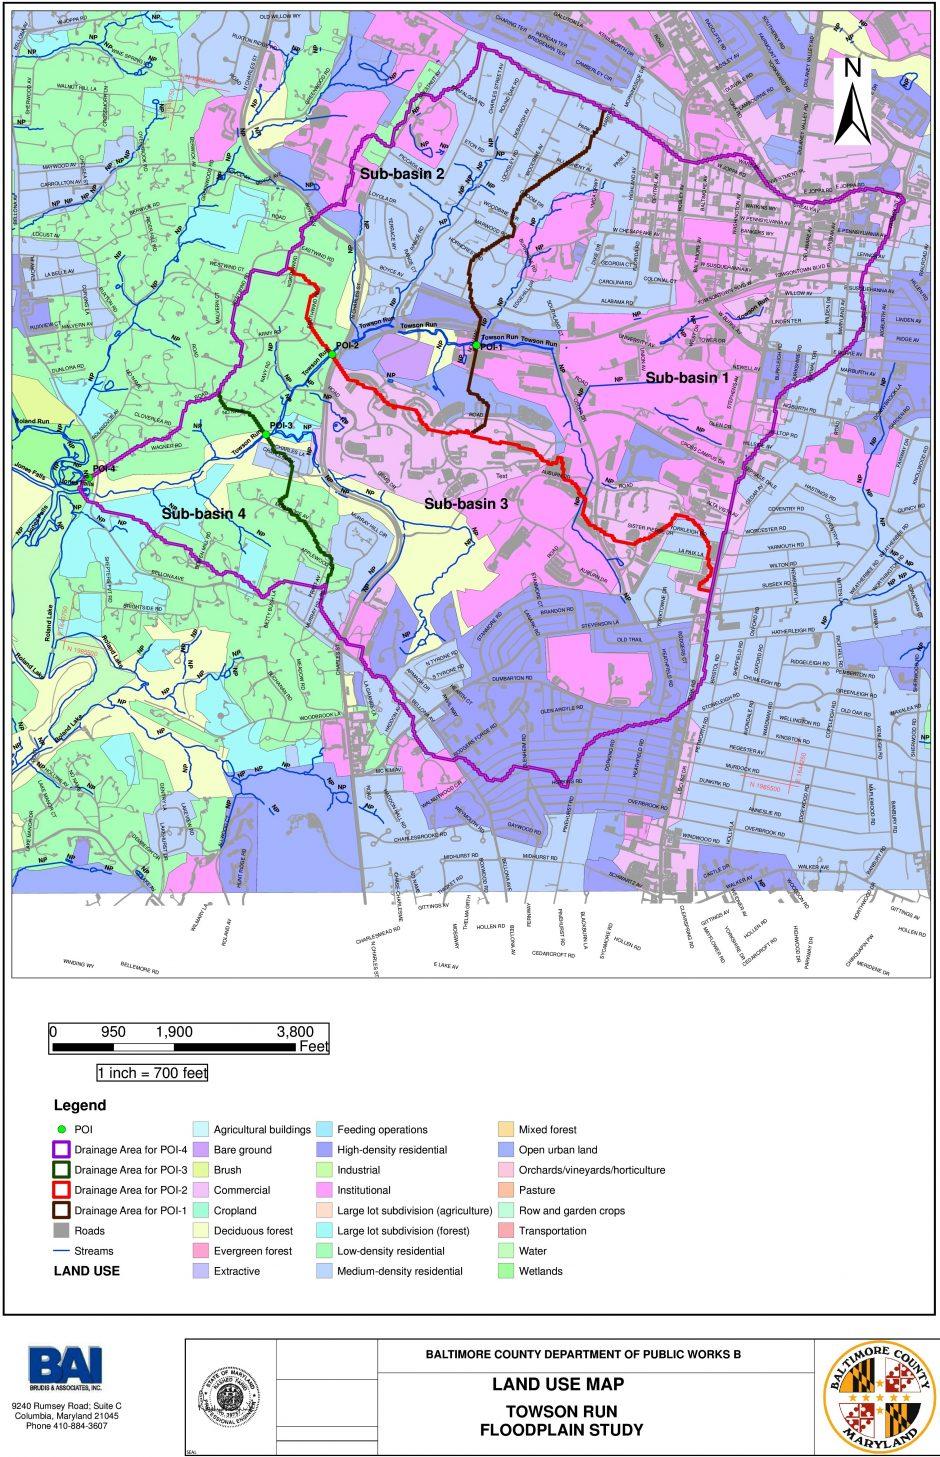 Map_LU-001